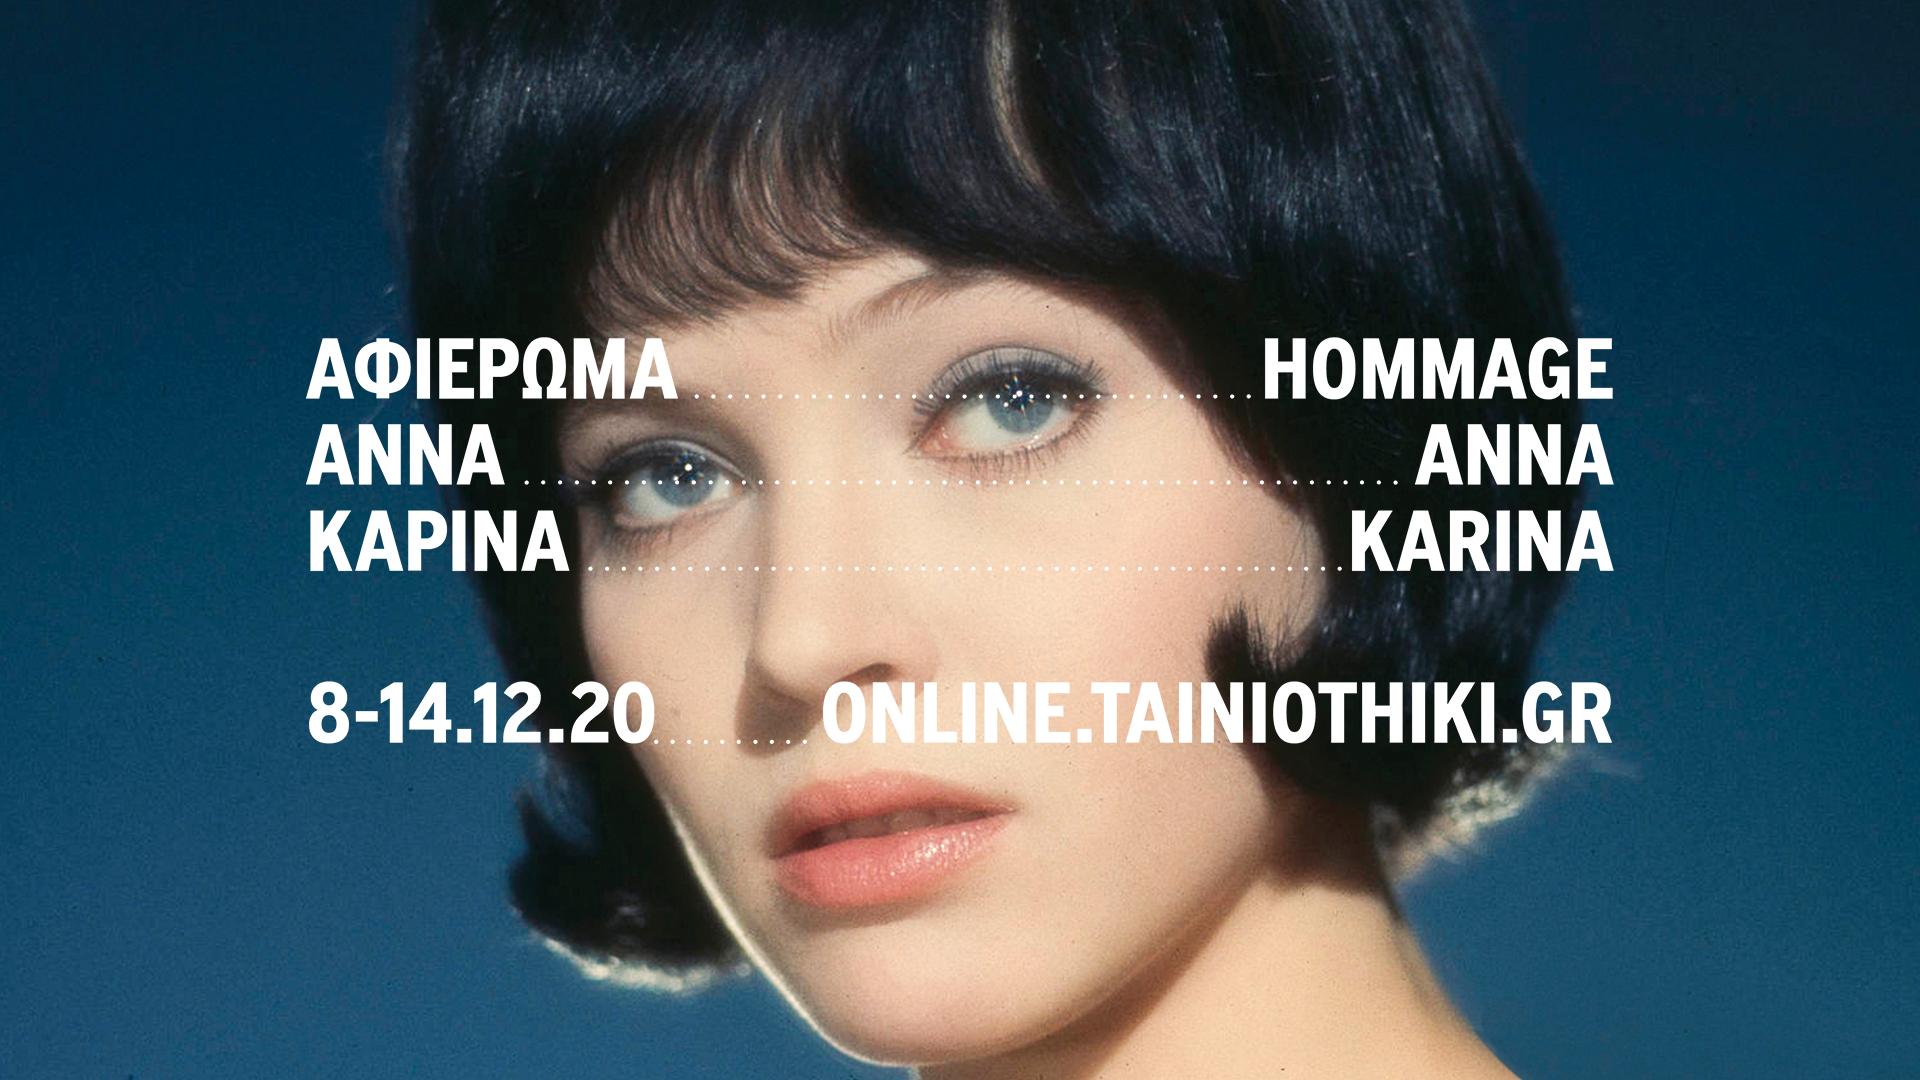 Tribute to Anna Karina